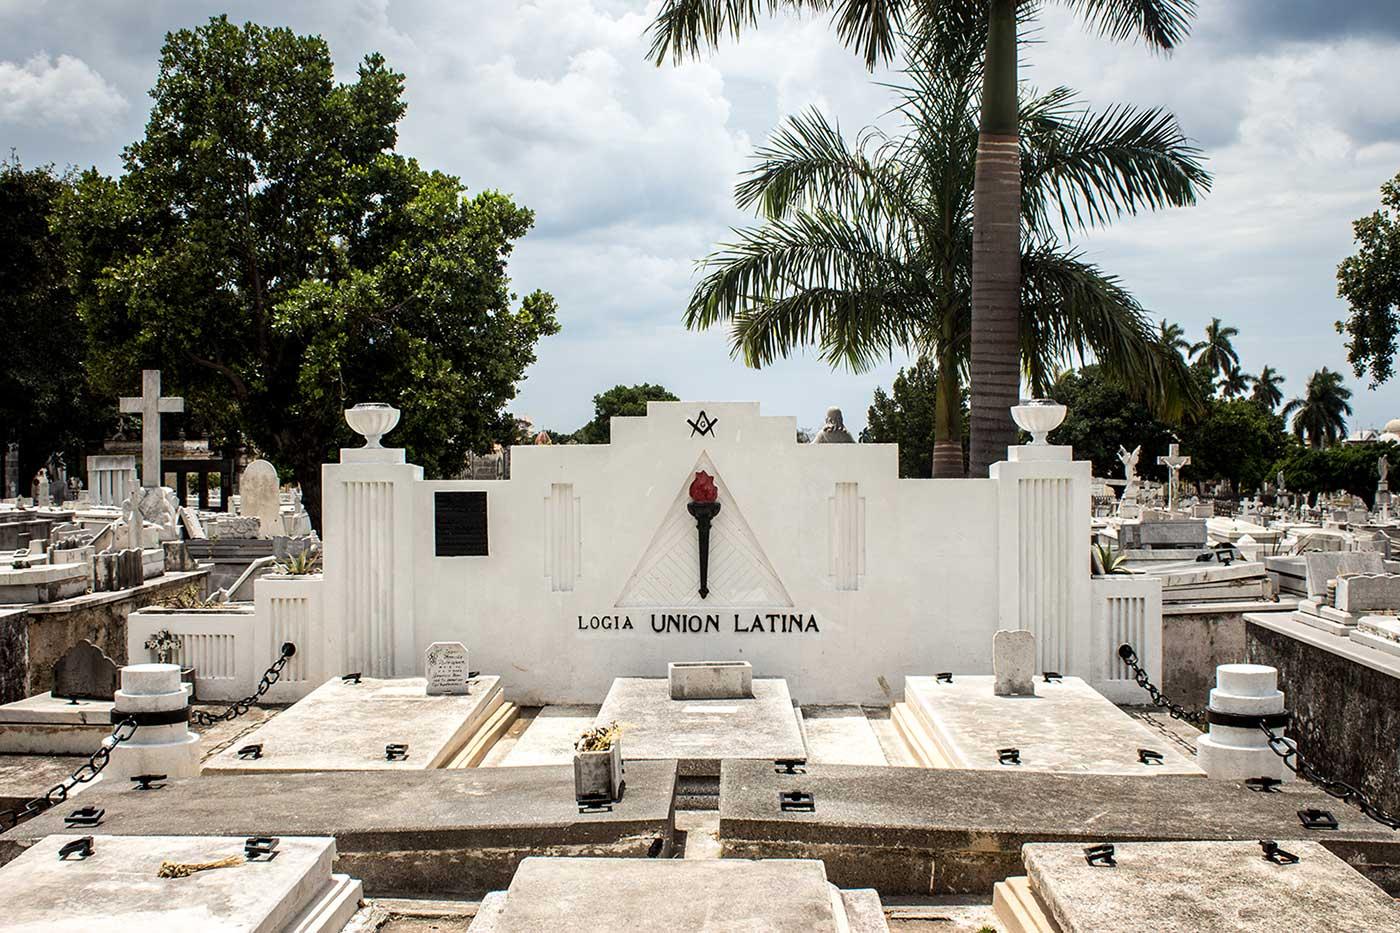 Memorial plot for 'Logia Union Latina': Necrópolis Cristóbal Colón, Havana, Cuba.